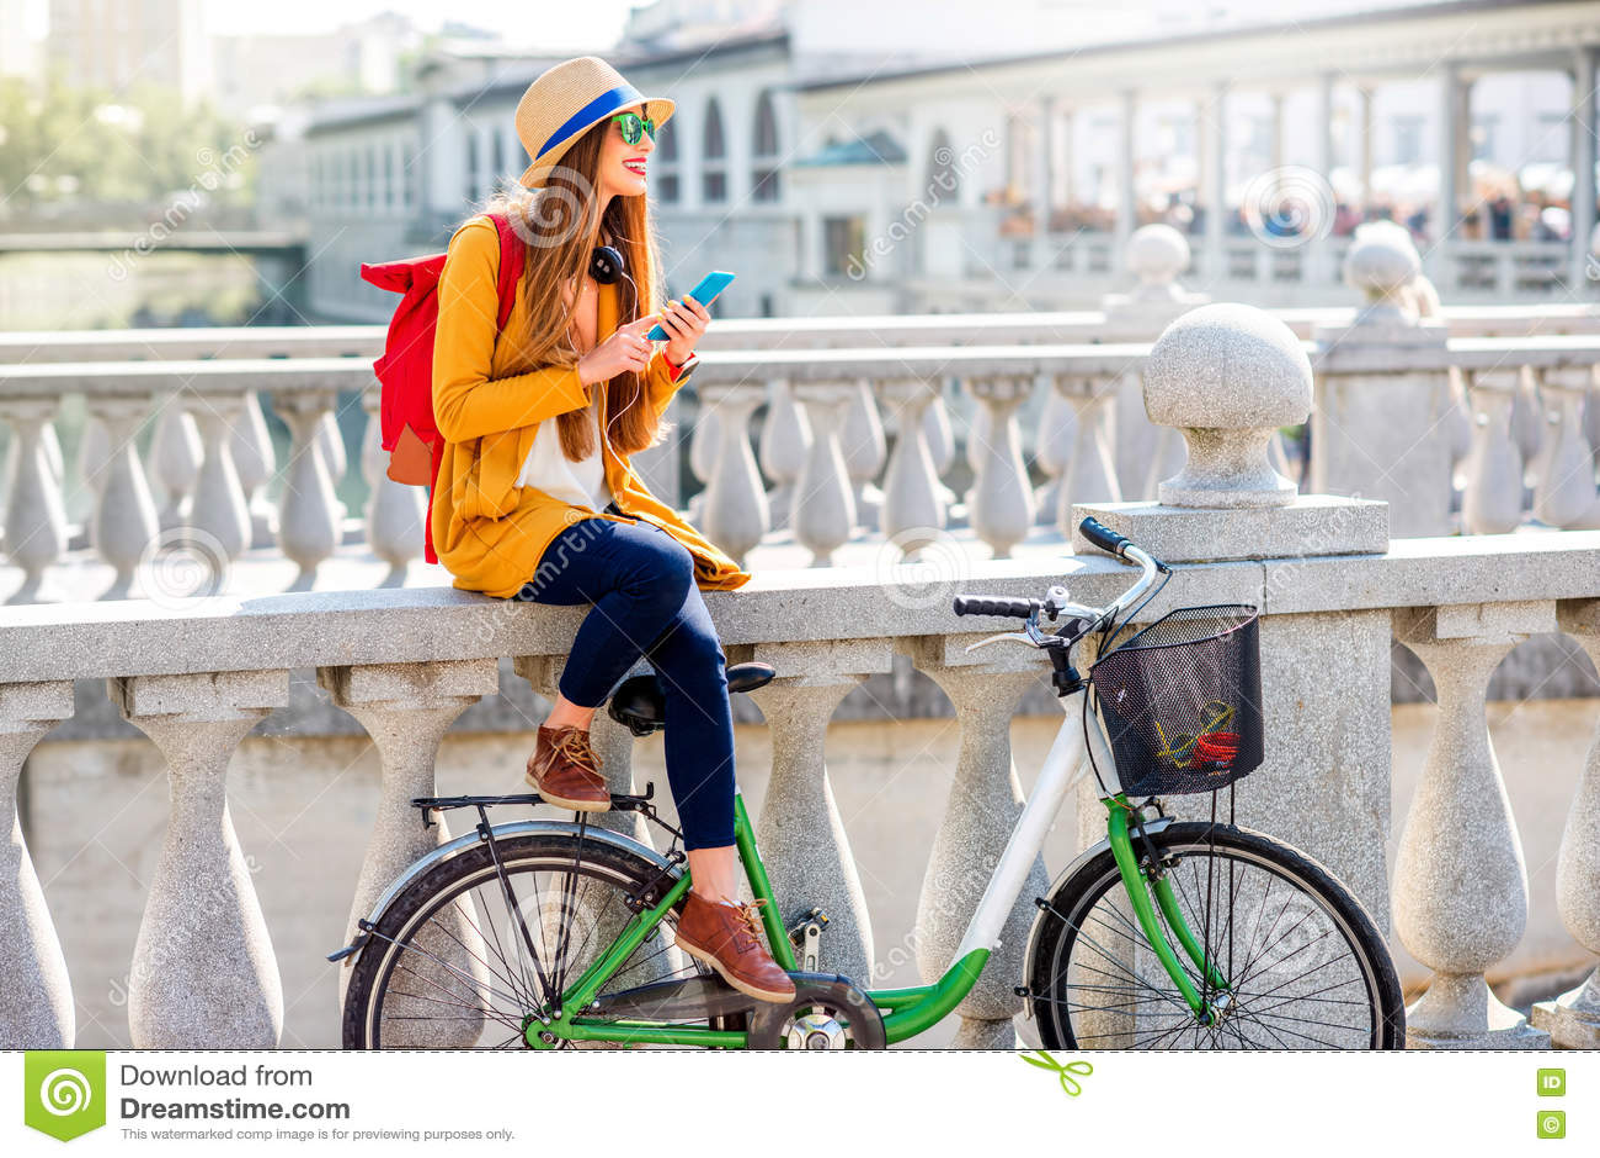 frau die mit fahrrad in ljubljana stadt reist stockfoto. Black Bedroom Furniture Sets. Home Design Ideas